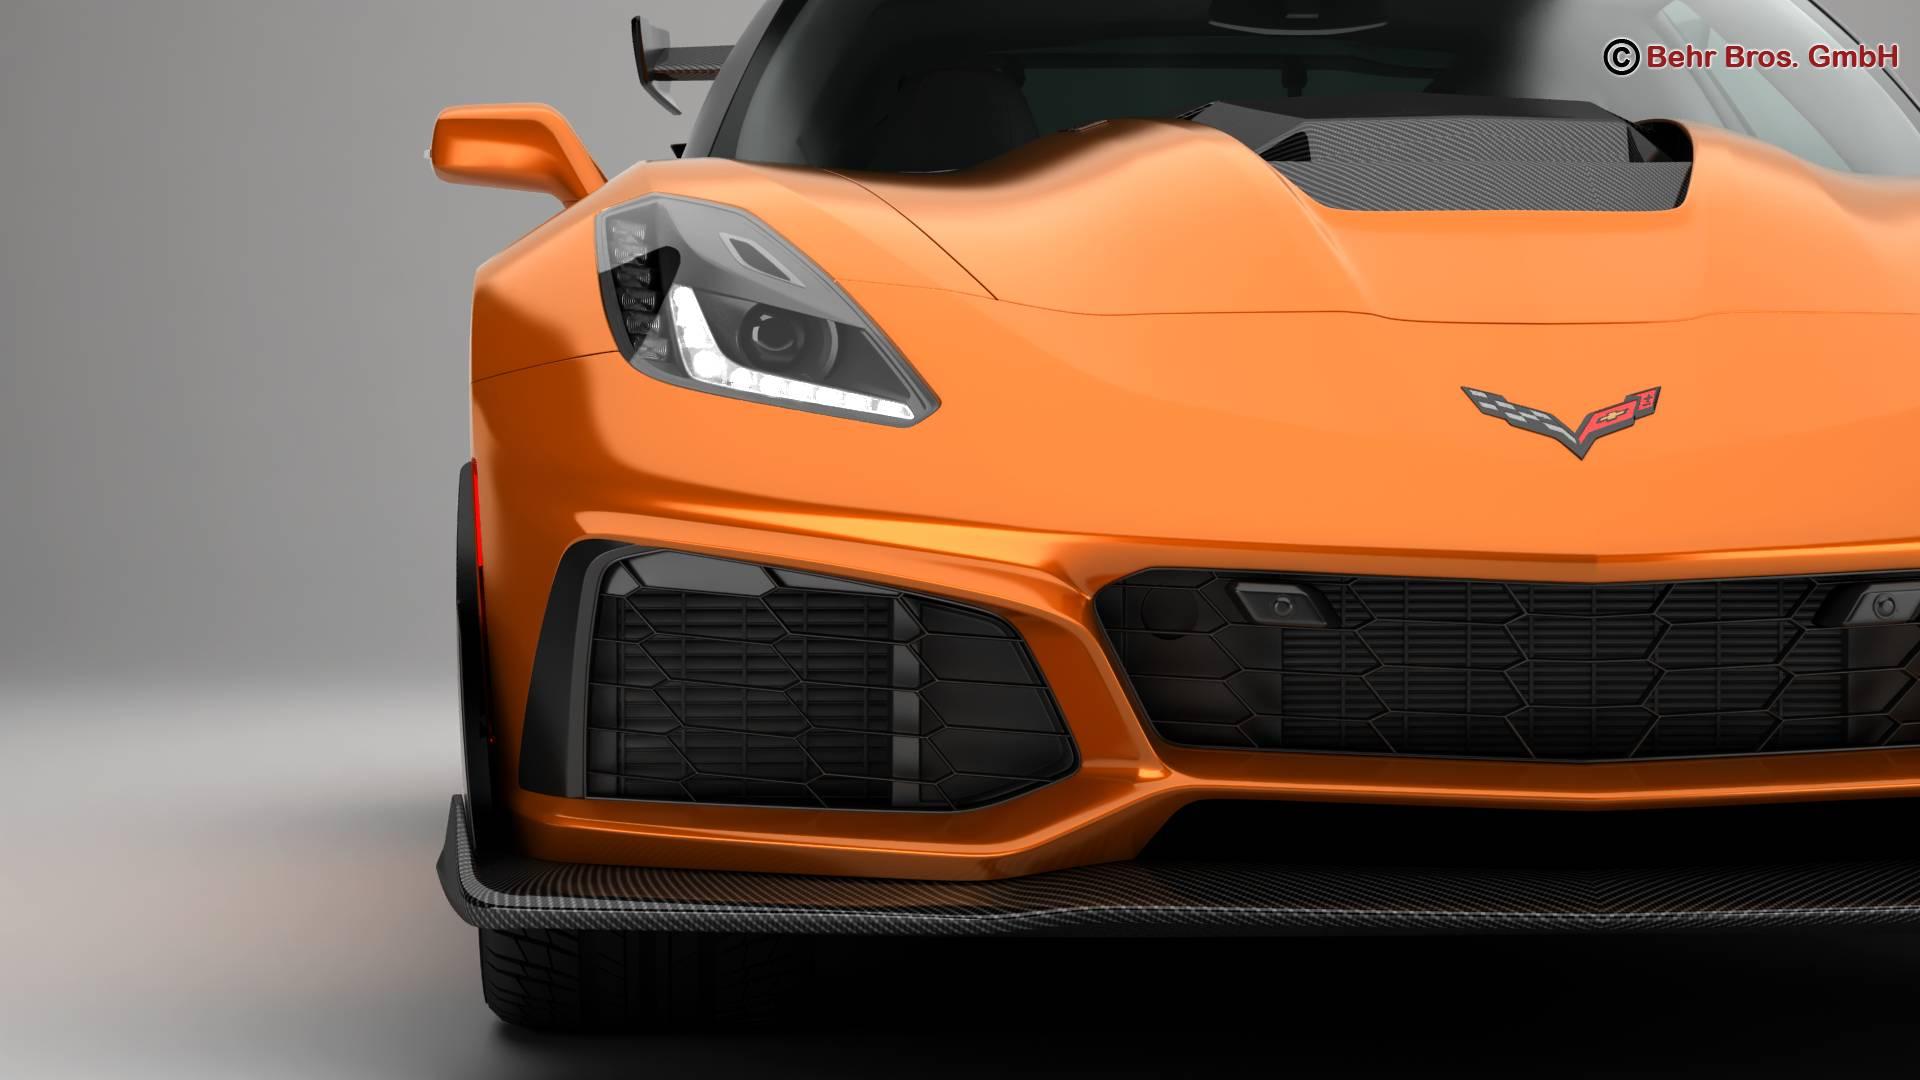 chevrolet corvette zr1 2019 3d model 3ds max fbx c4d lwo ma mb obj 275973